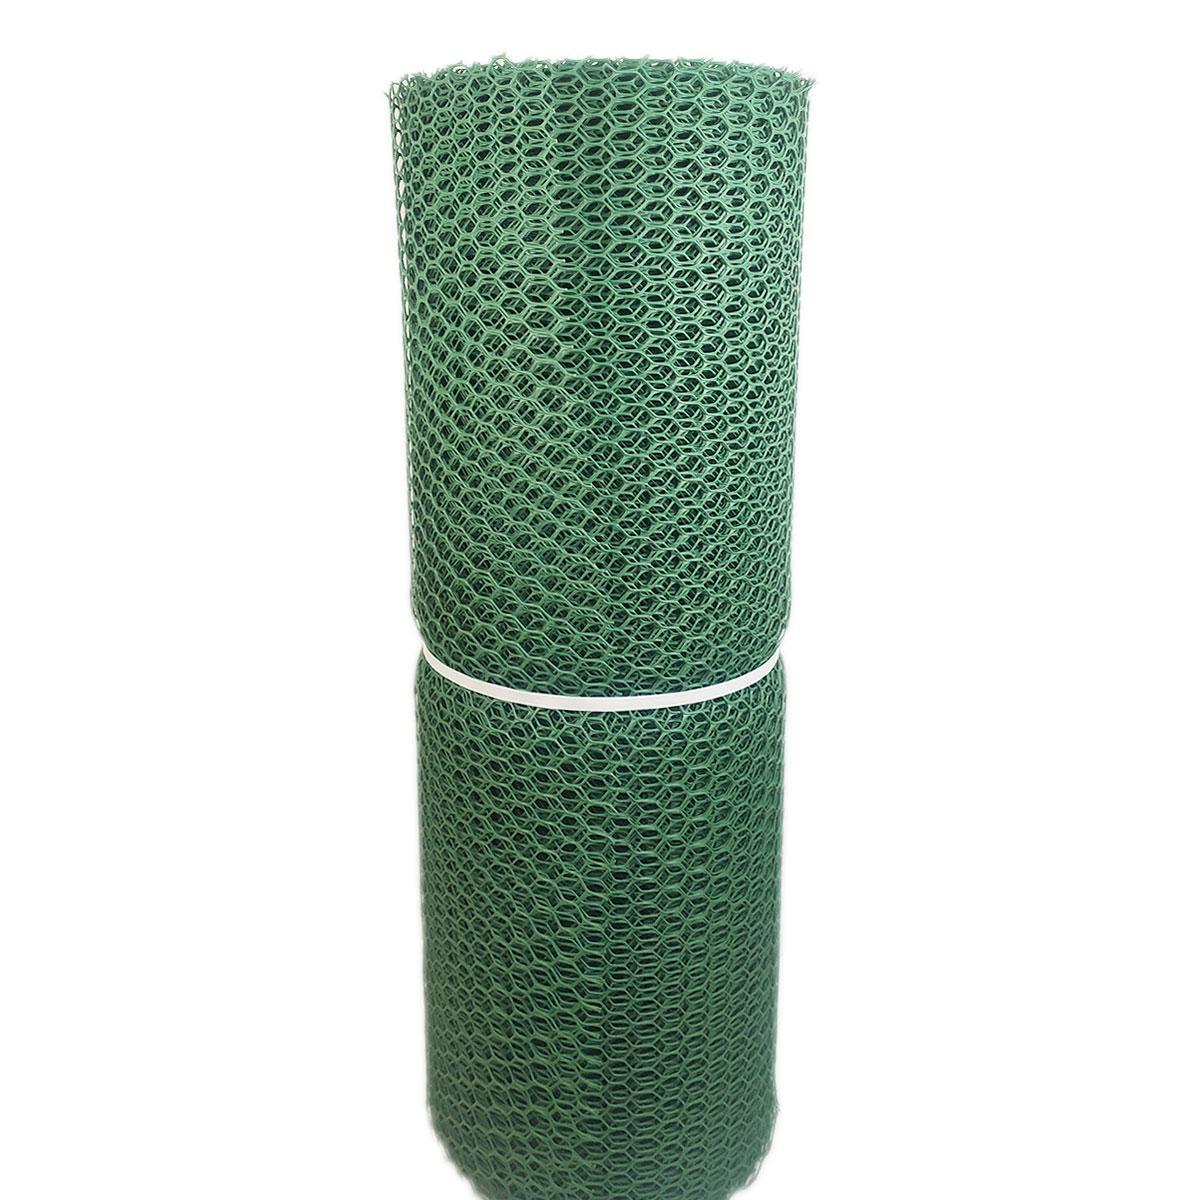 Забор садовый.Ячейка 20х20 мм, рул. 1.2м х 30 м (темно-зеленая).Ромб(Сота) паркан